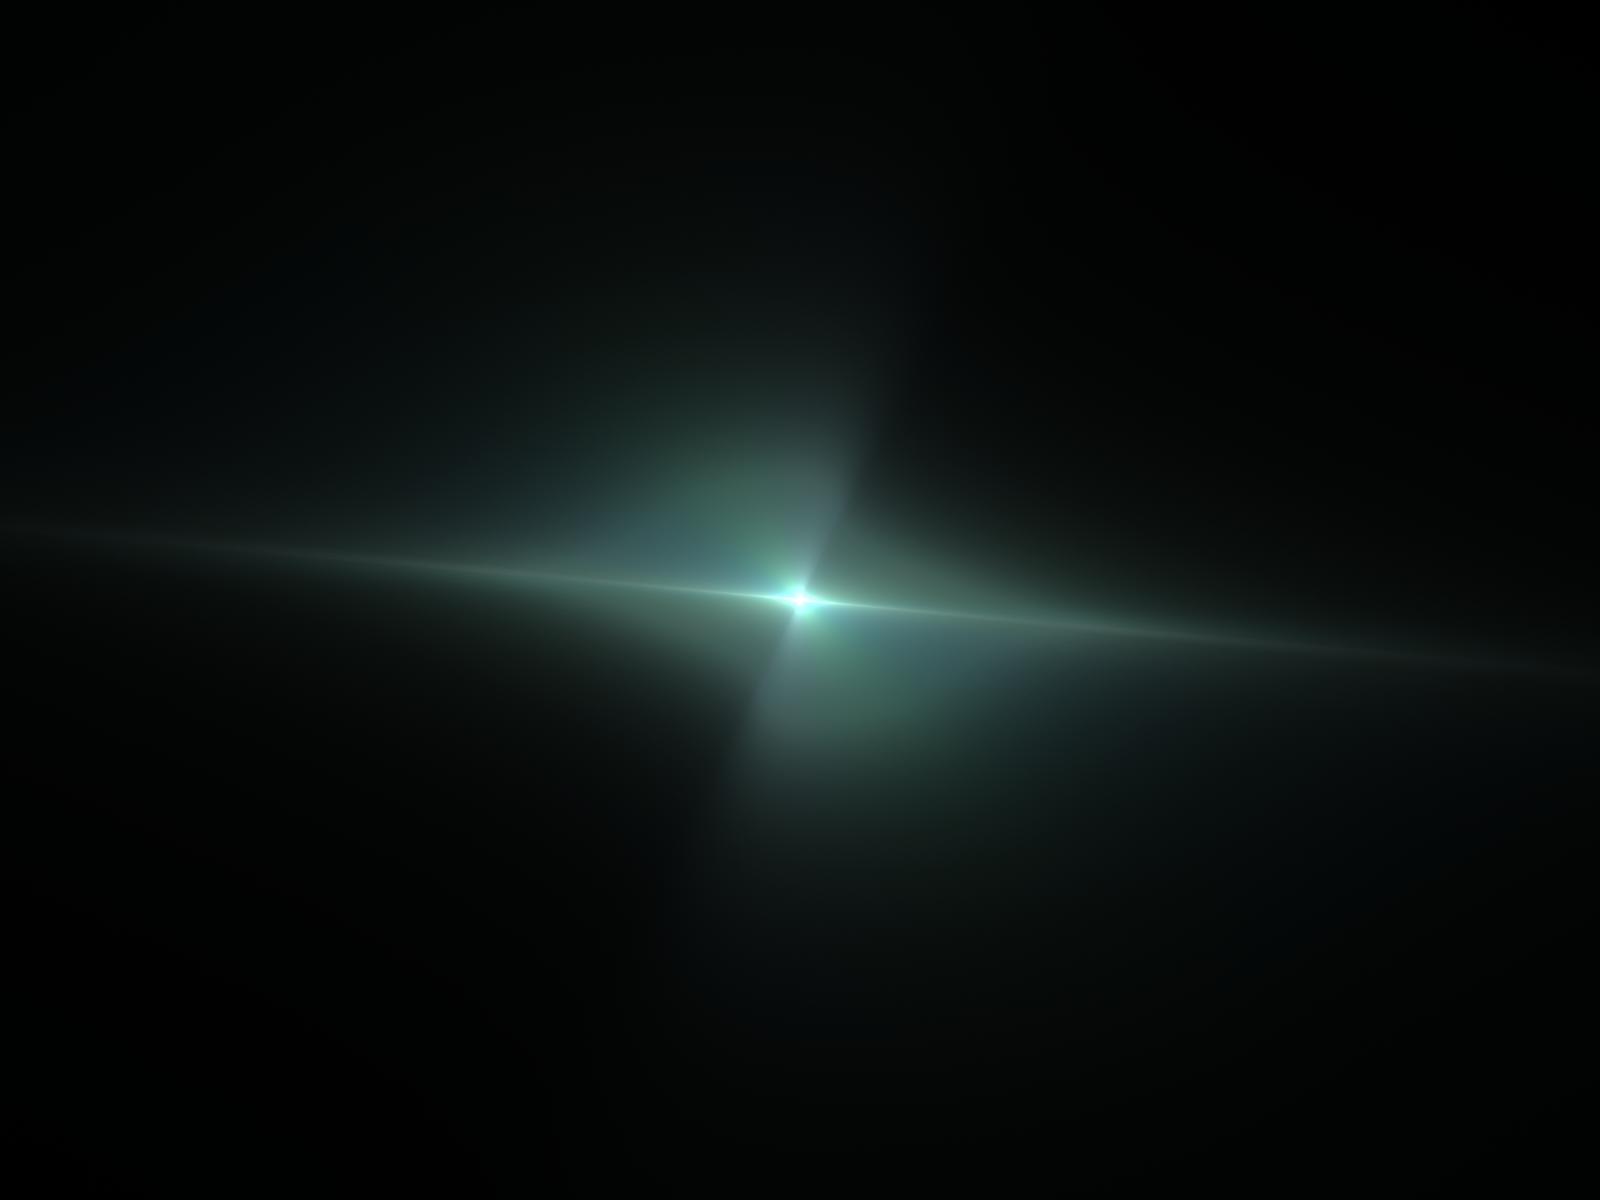 Light Burst by diskkun on DeviantArt